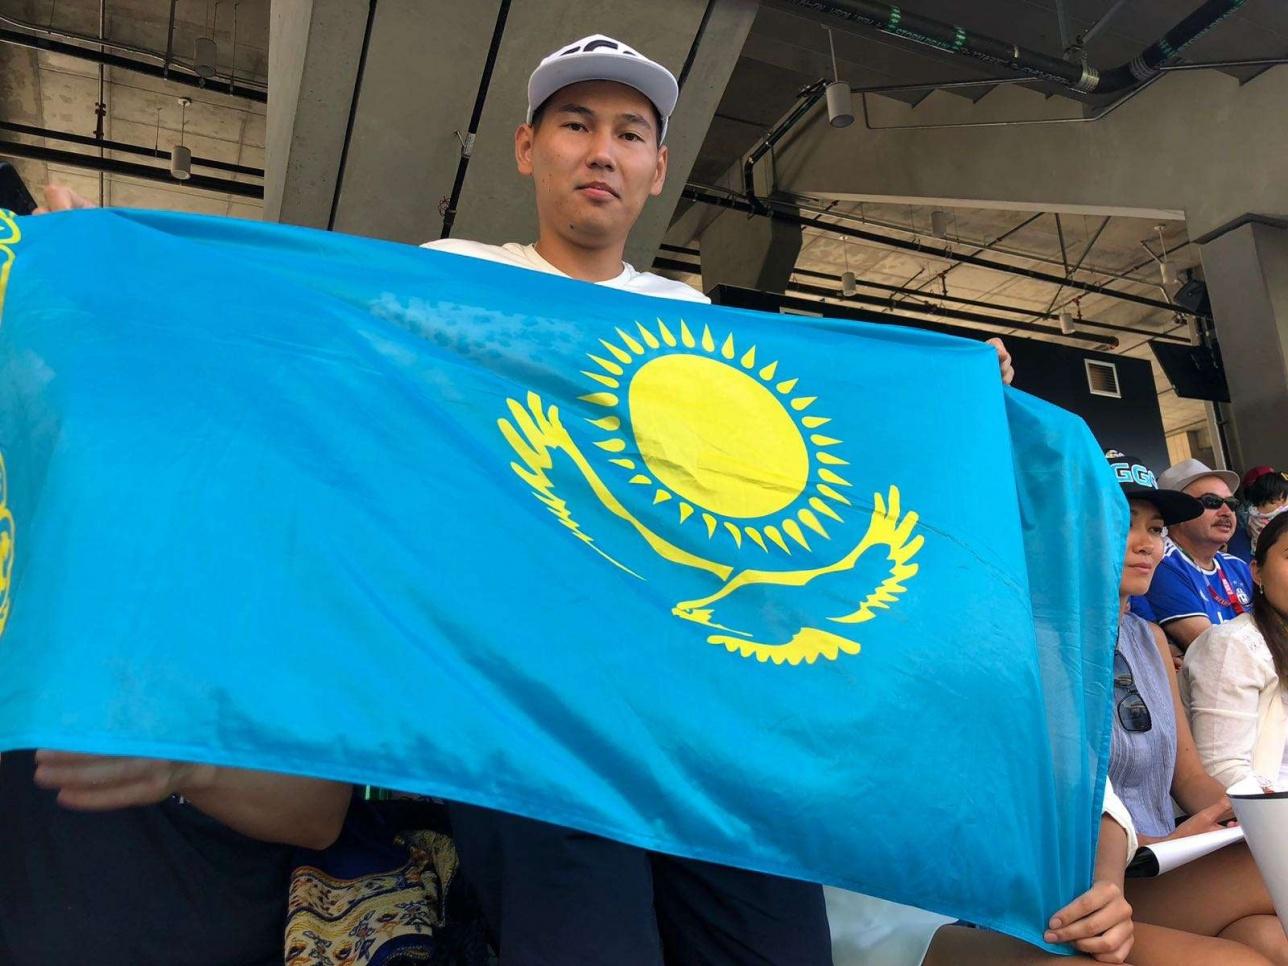 Флаг Казахстана на стадионе Лос-Анджелеса